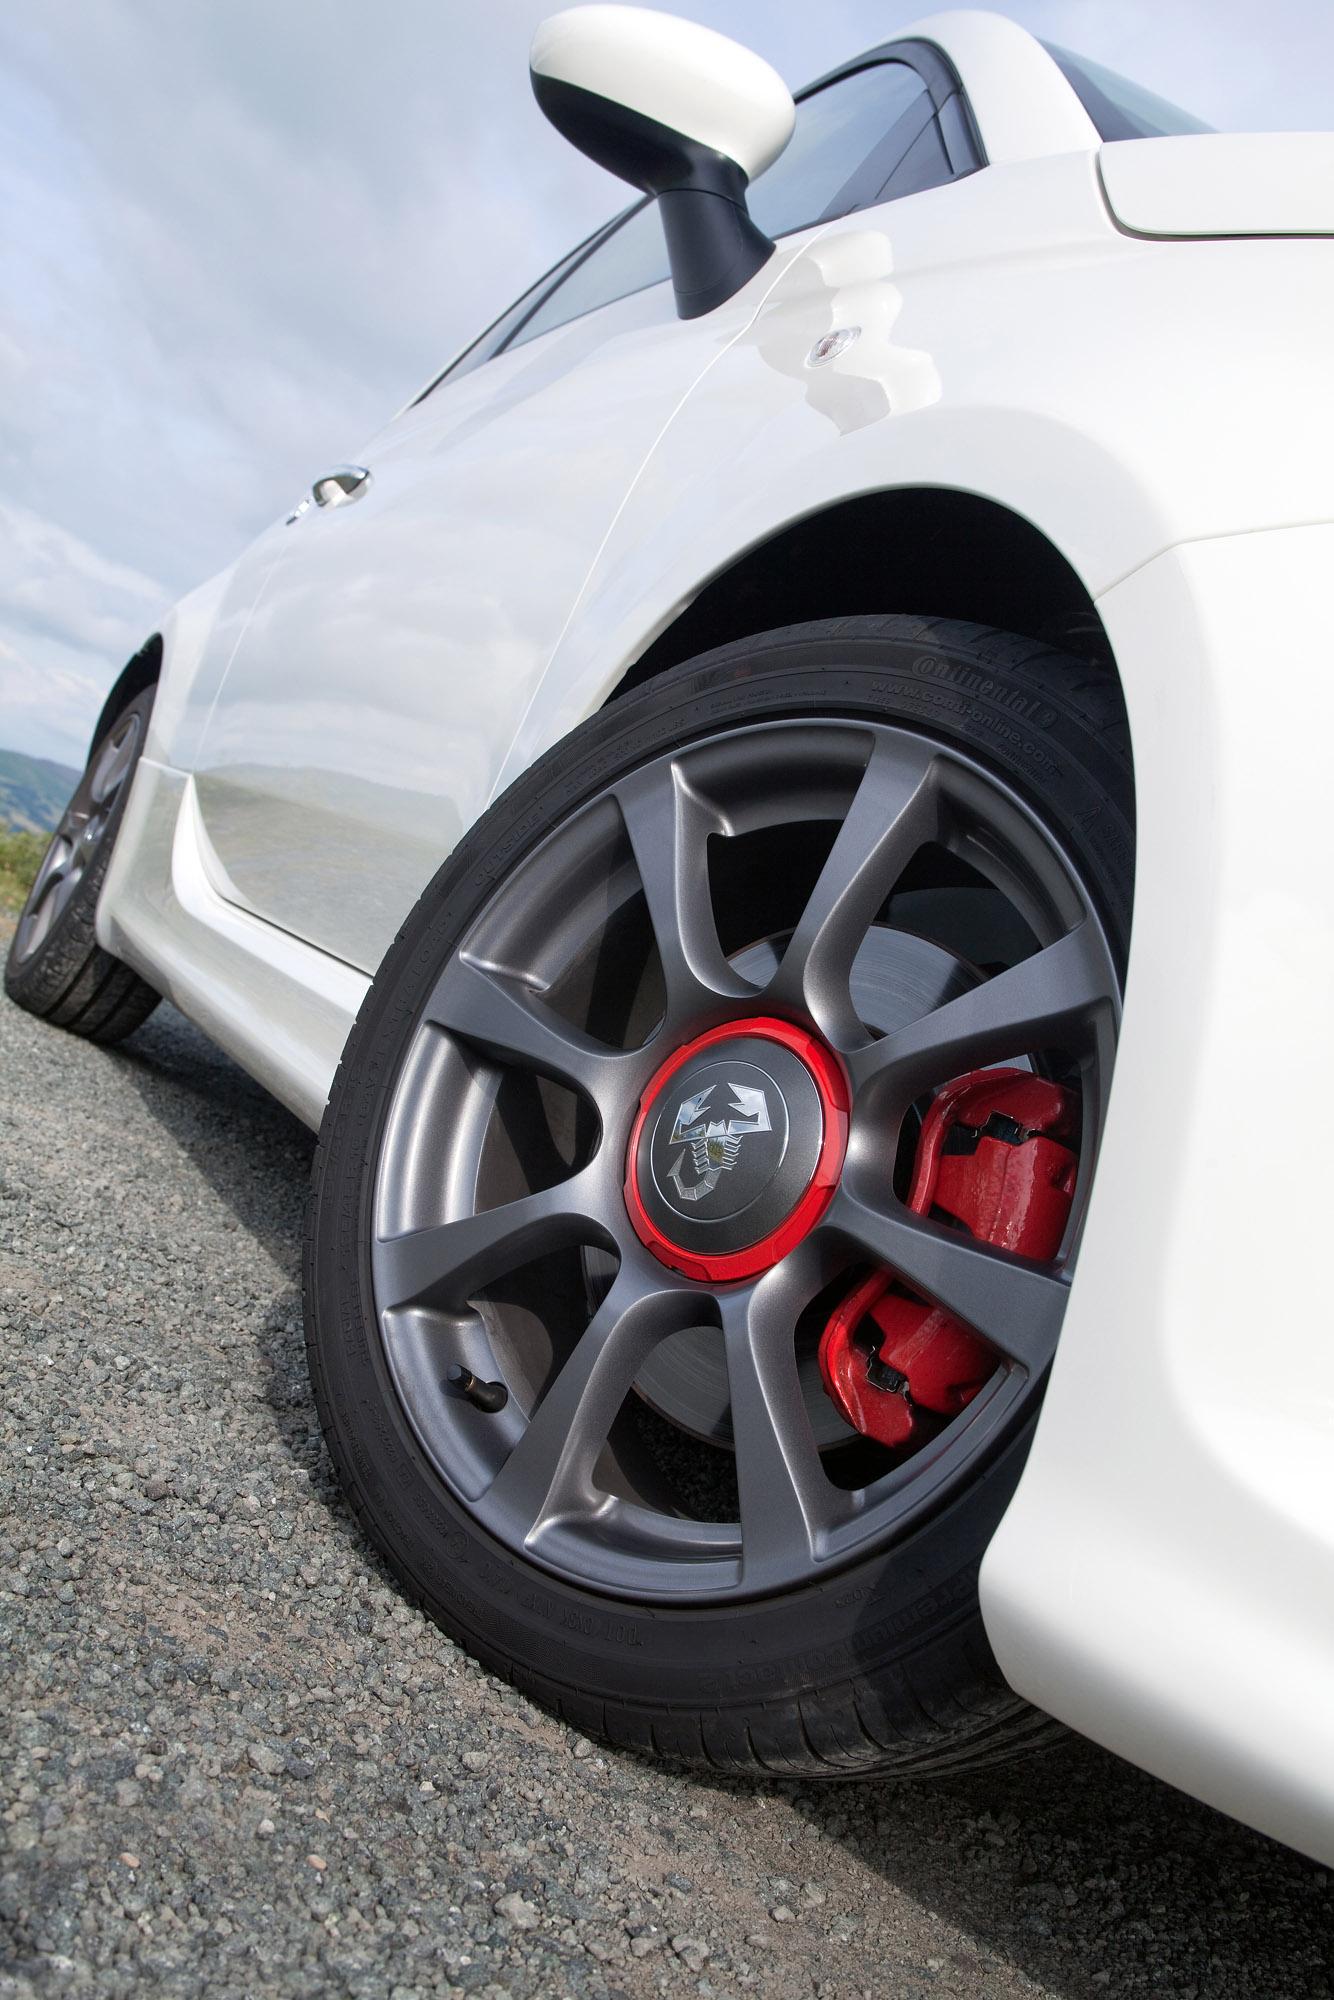 2010 Abarth 500c Offers Unique Driving Pleasure